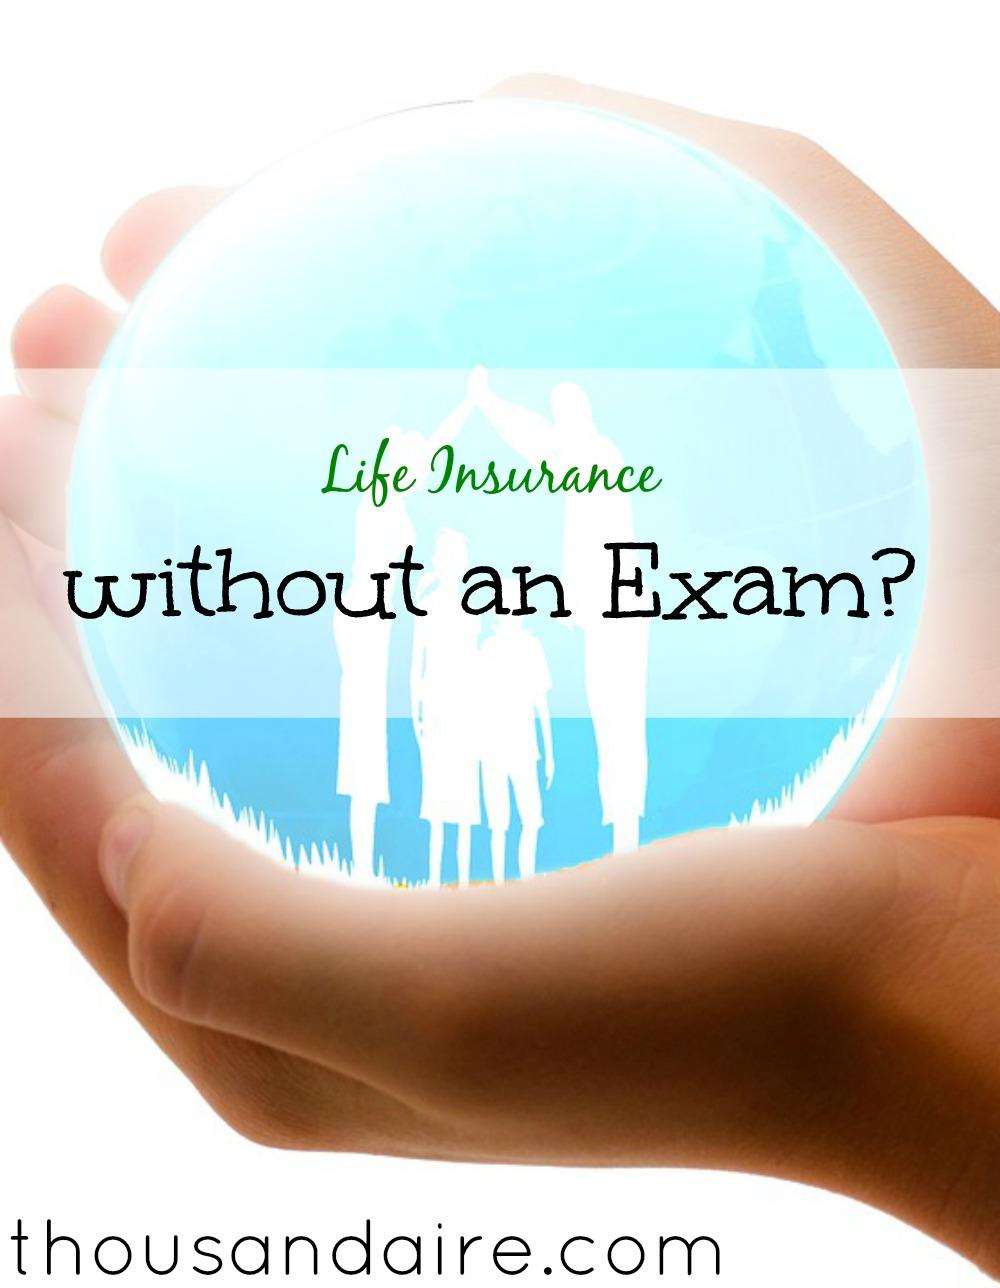 life insurance advice, life insurance tips, information on life insurance